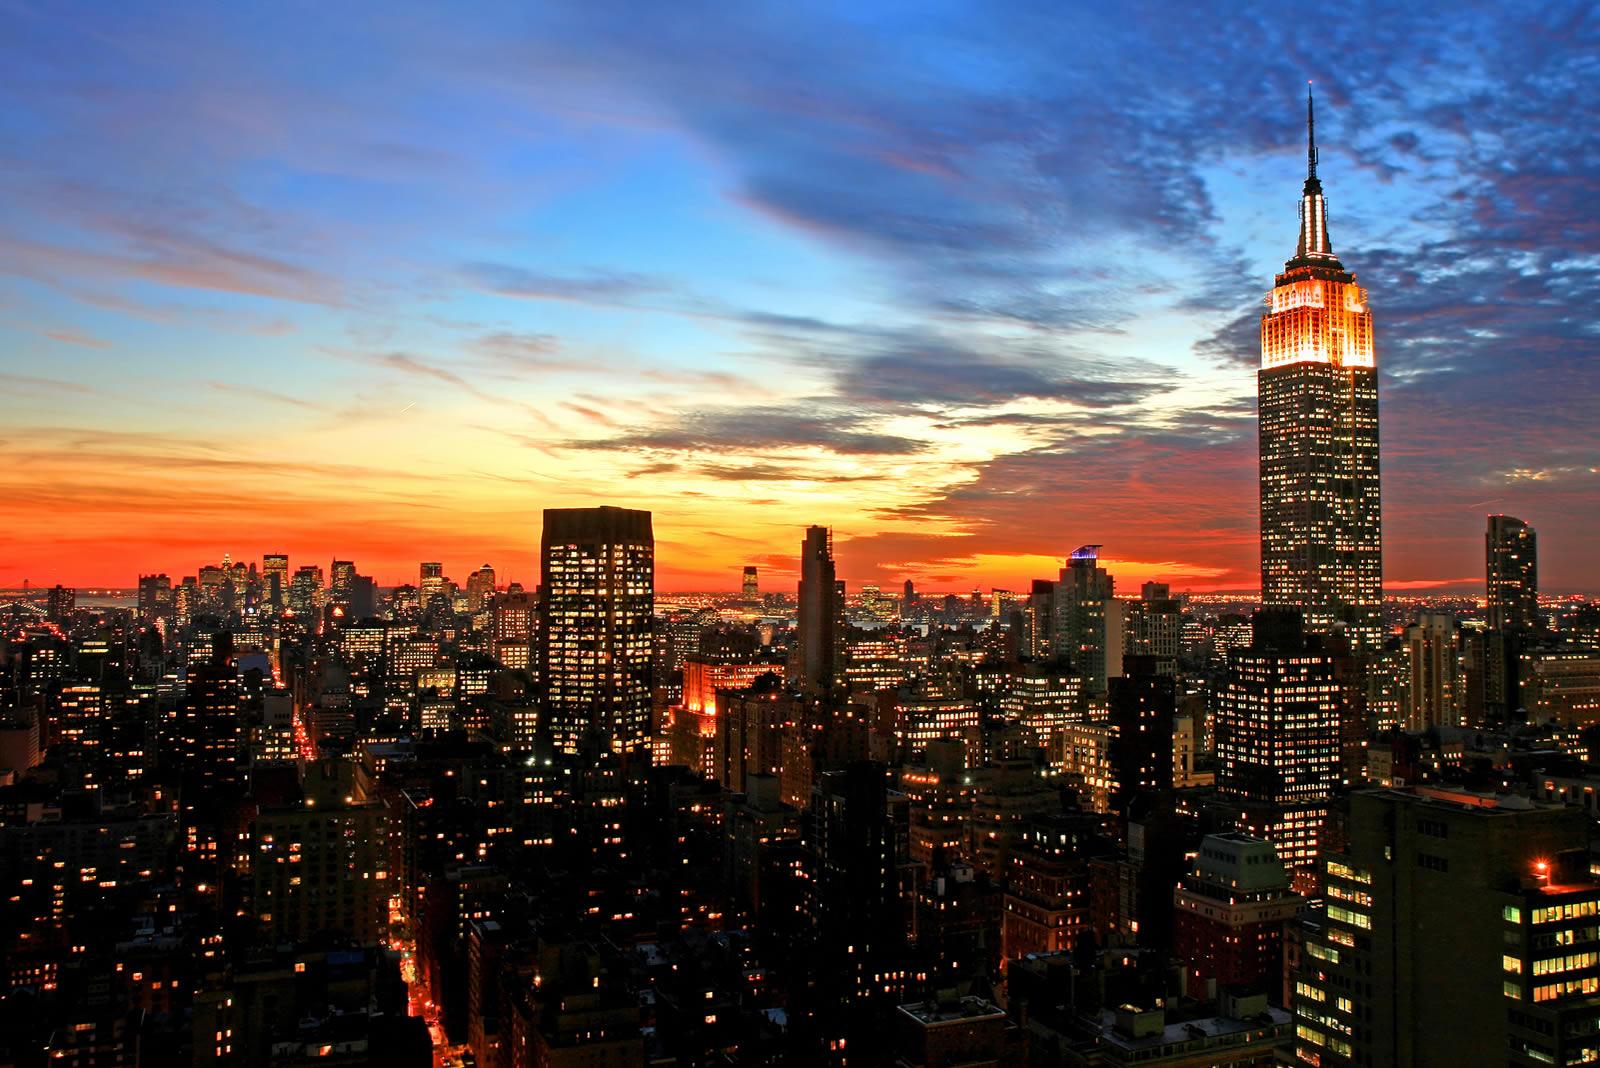 G-iron in New York